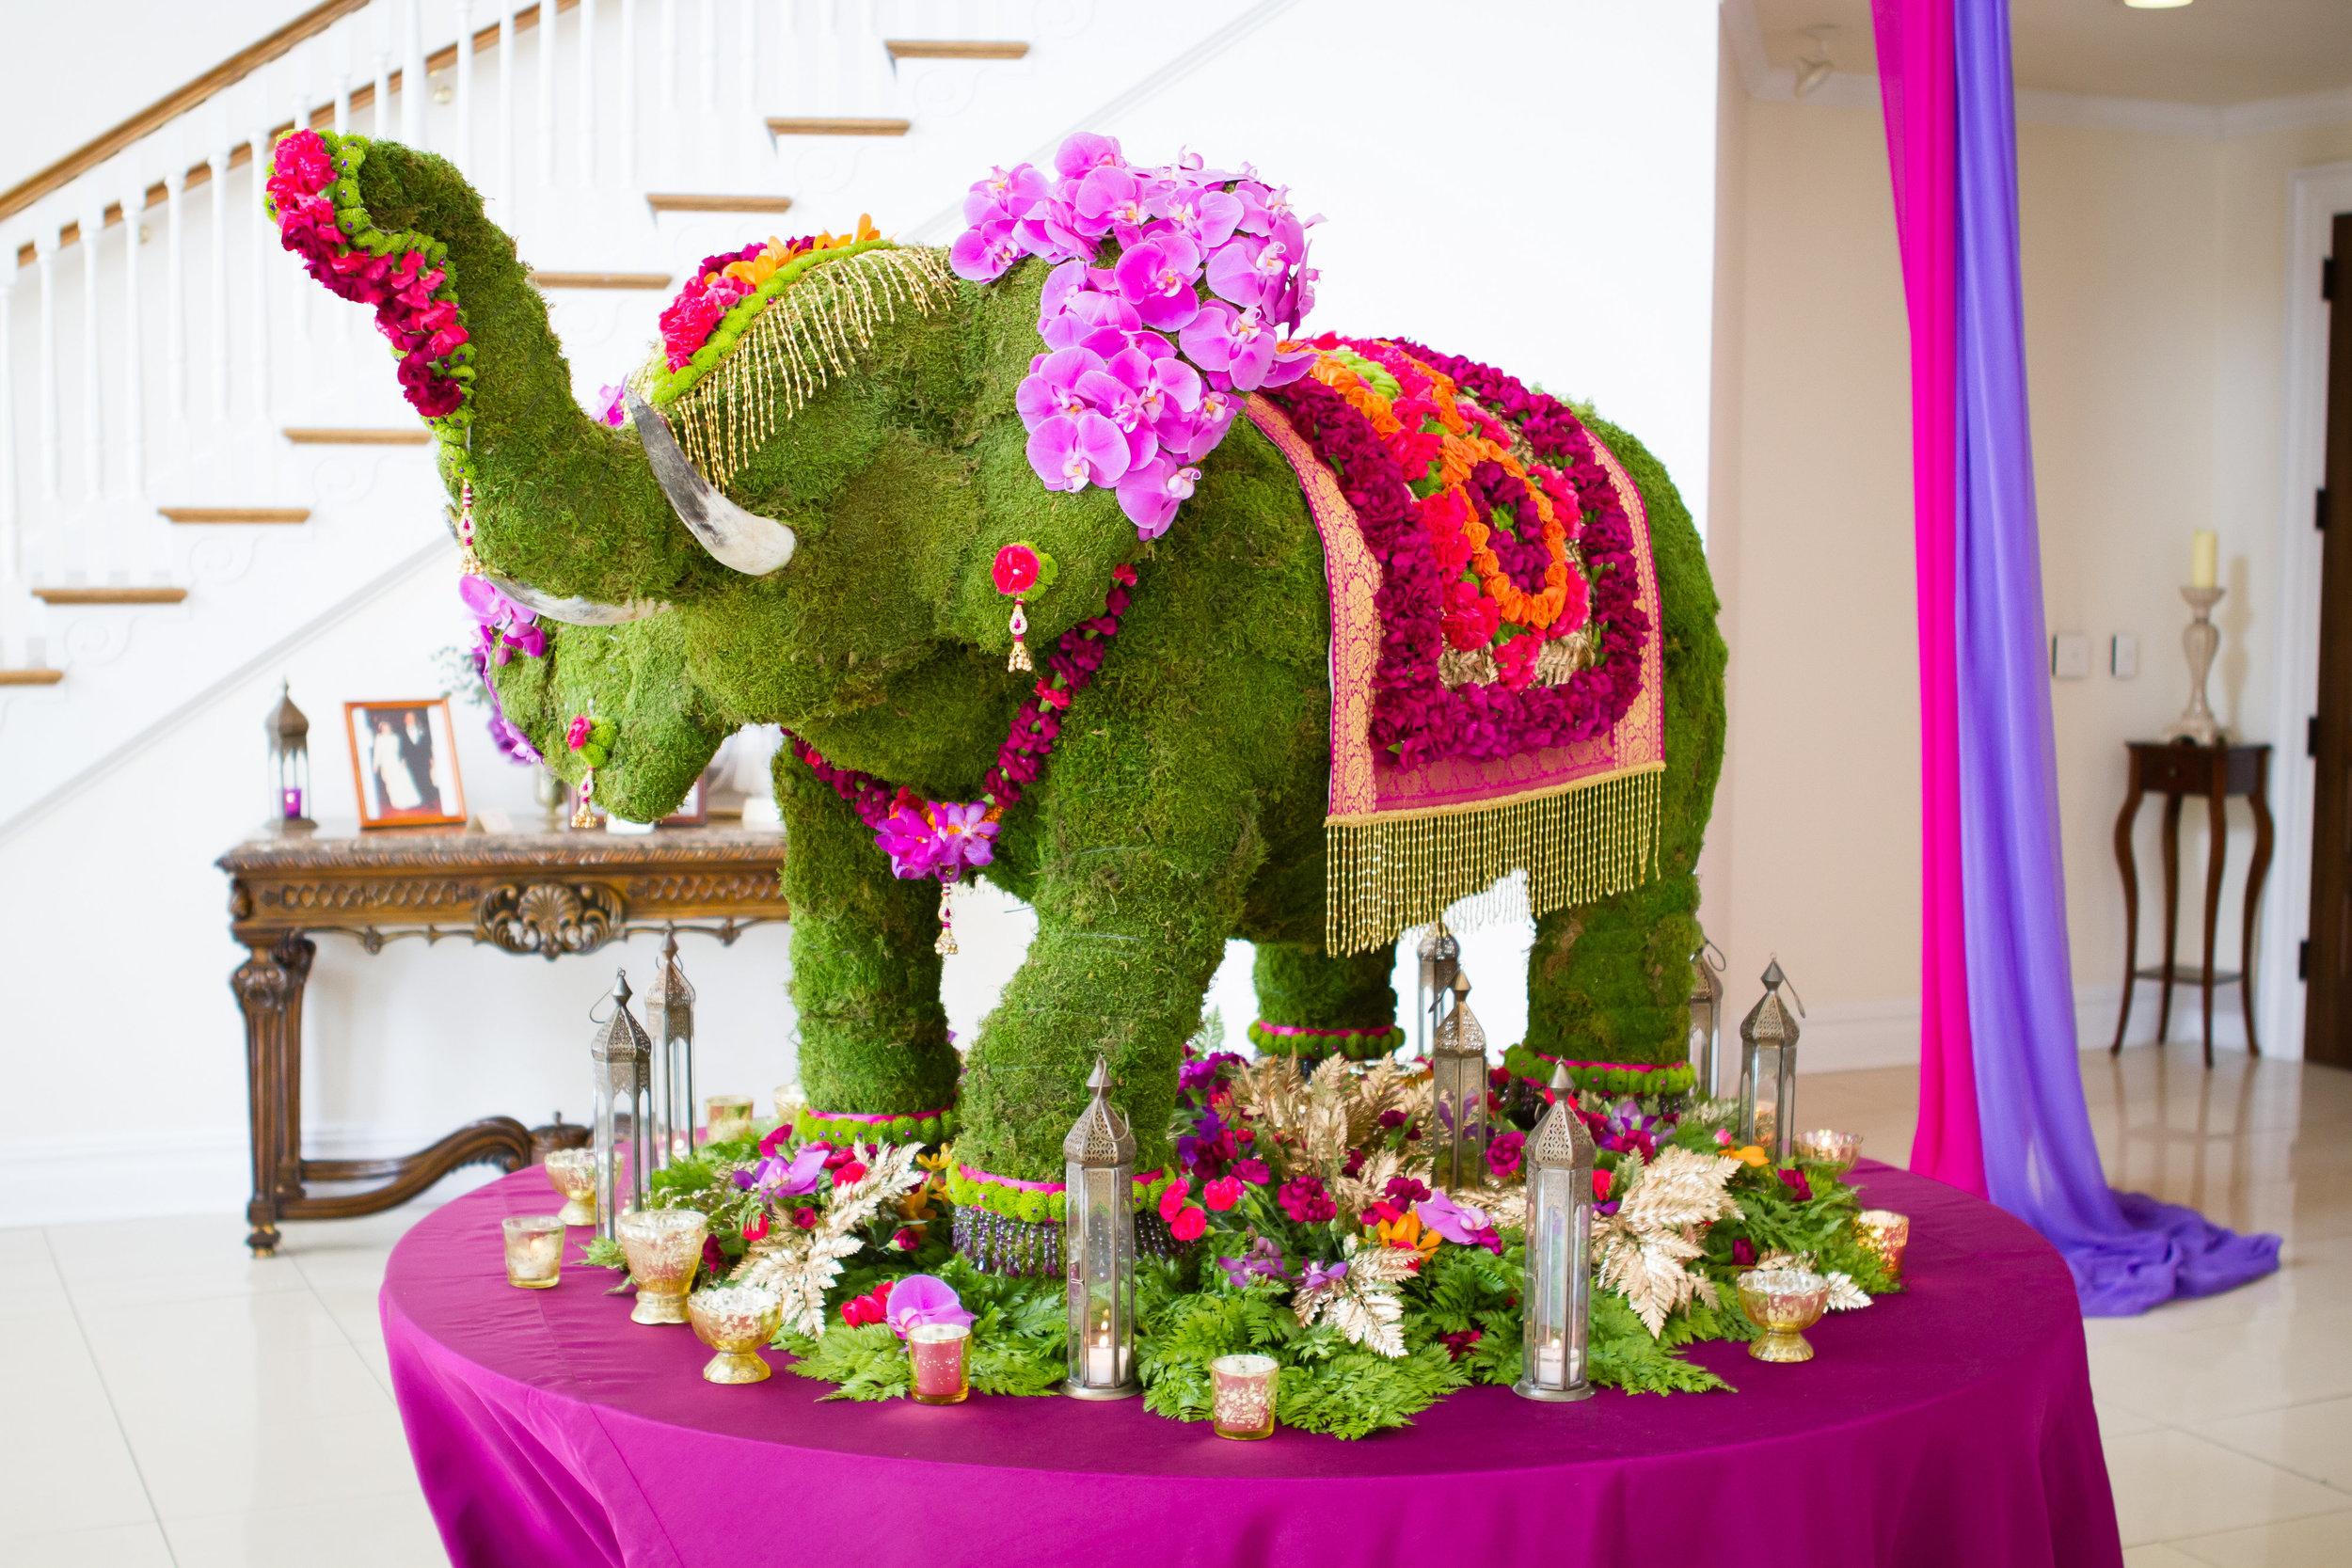 NJ Wedding, Seating Chart, Seating Assignments, Wedding Inspo, A Garden Party, Indian Wedding, Elephant, Flower Elephant